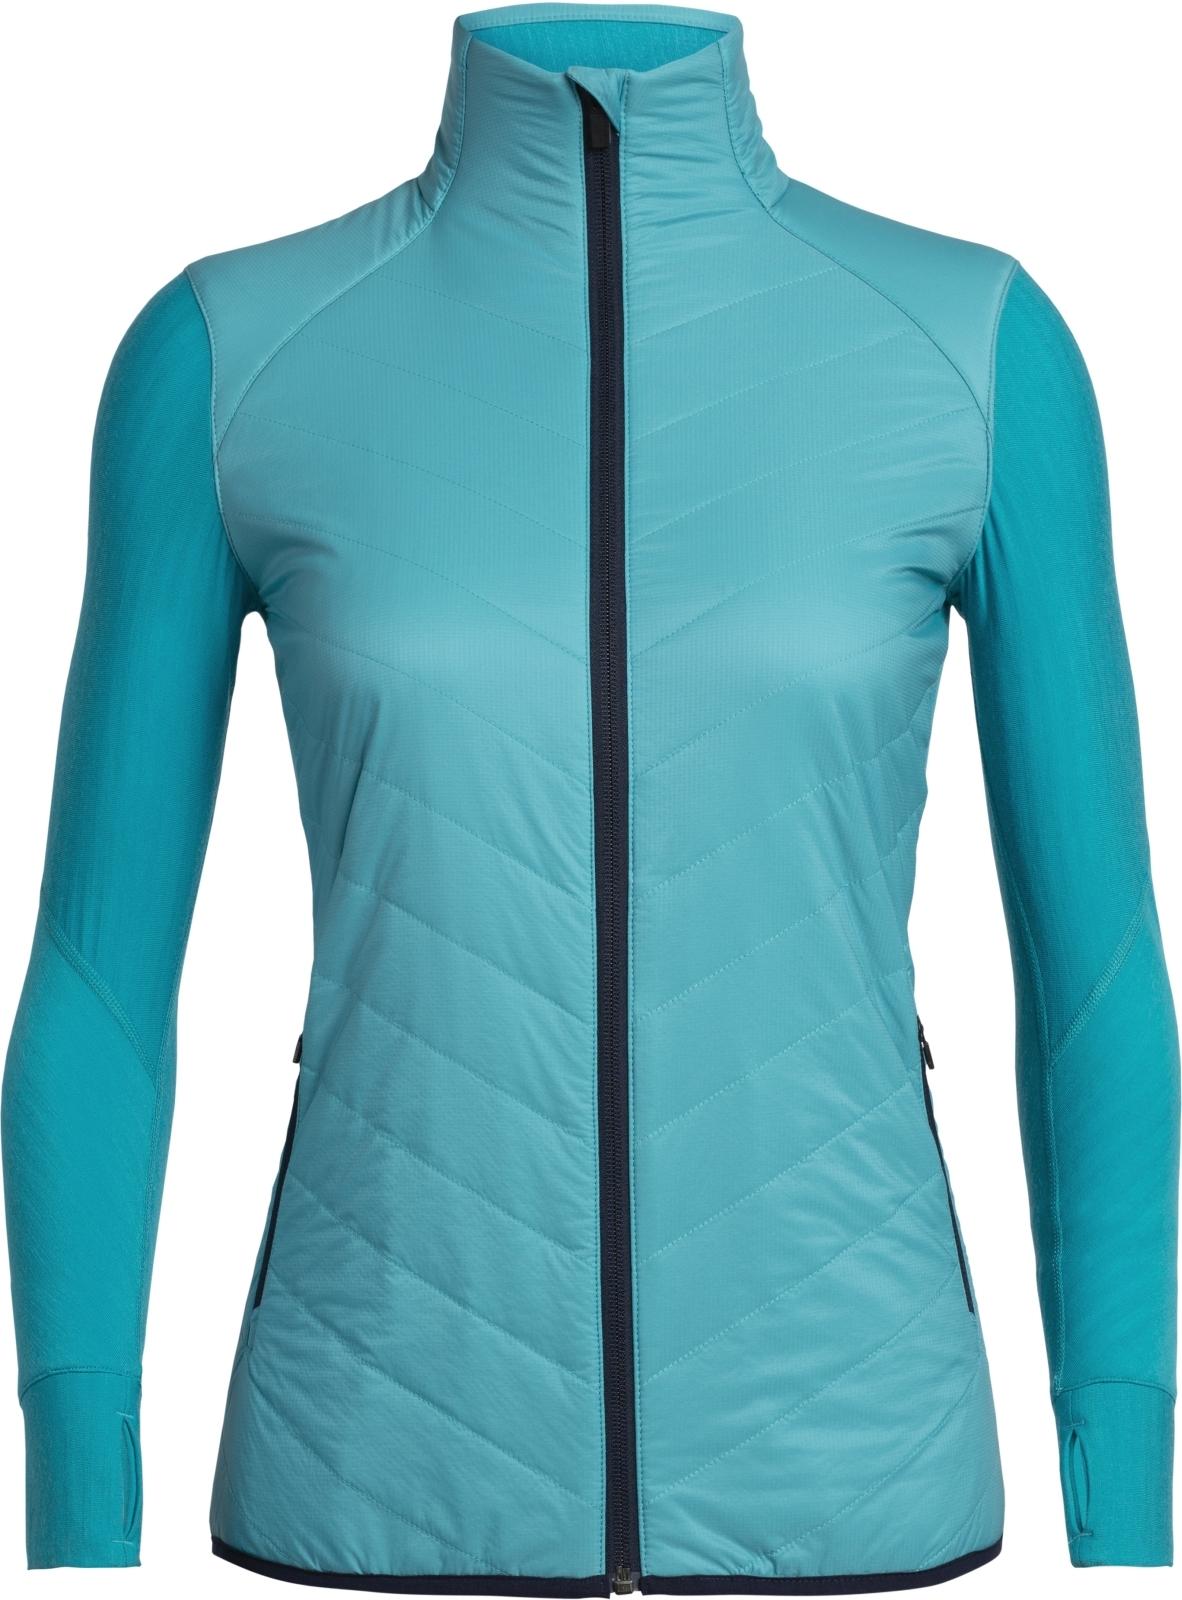 Icebreaker Womens Descender Hybrid Jacket - arctic teal XS